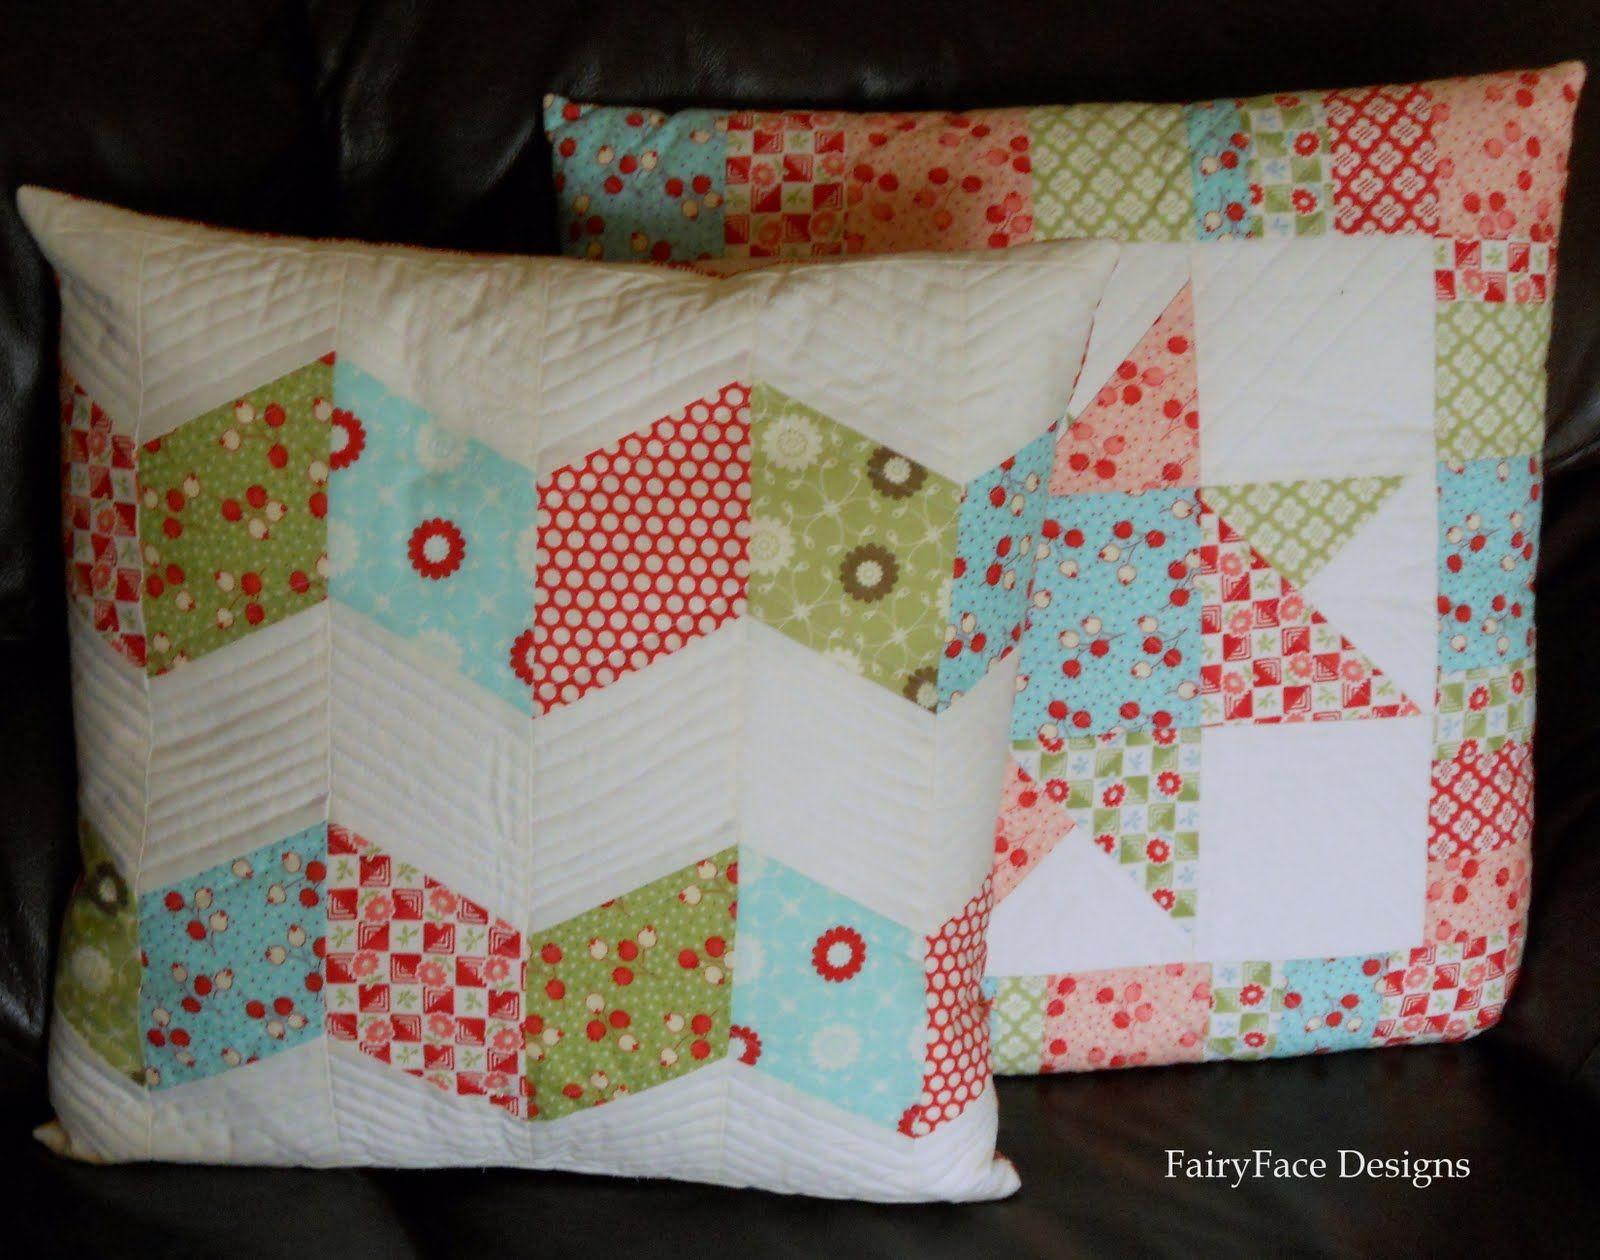 FairyFace Designs: Chunky ZigZag Pillow Tutorial